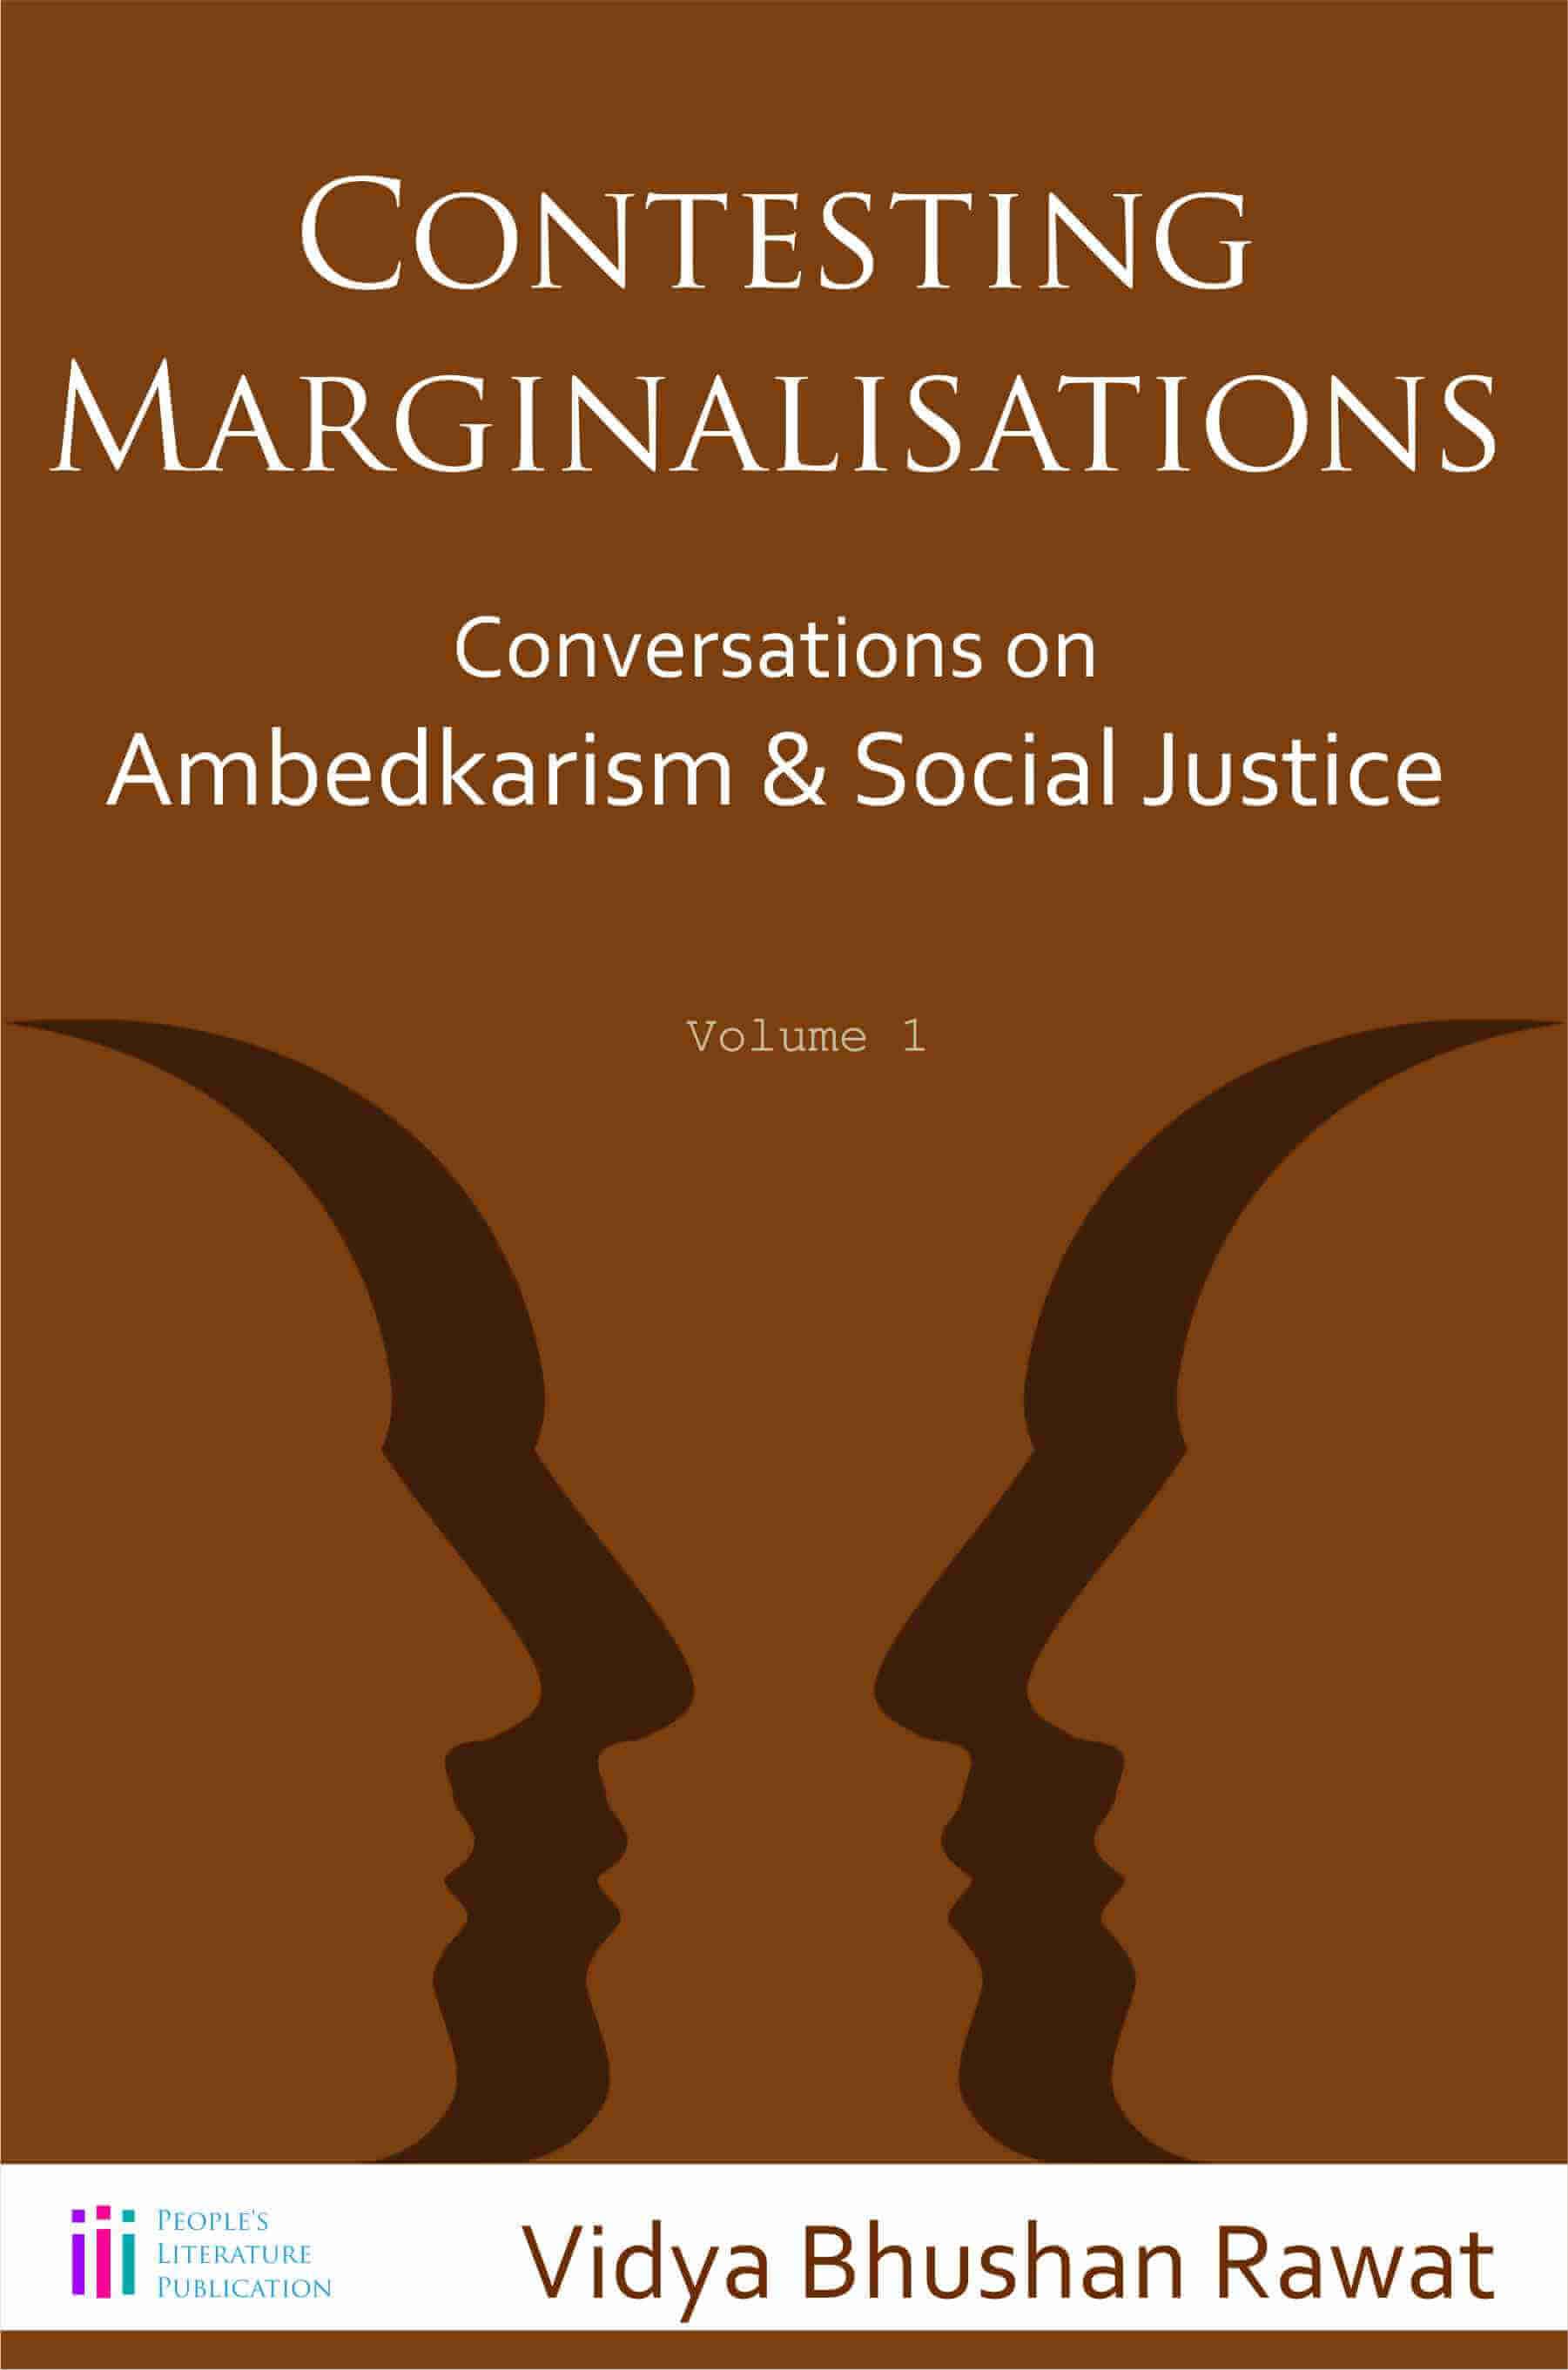 Vidya Bhushan Rawat <em>Contesting Marginalisations: Conversations on Ambedkarism and Social Justice</em> People's Literature Publication, 2017